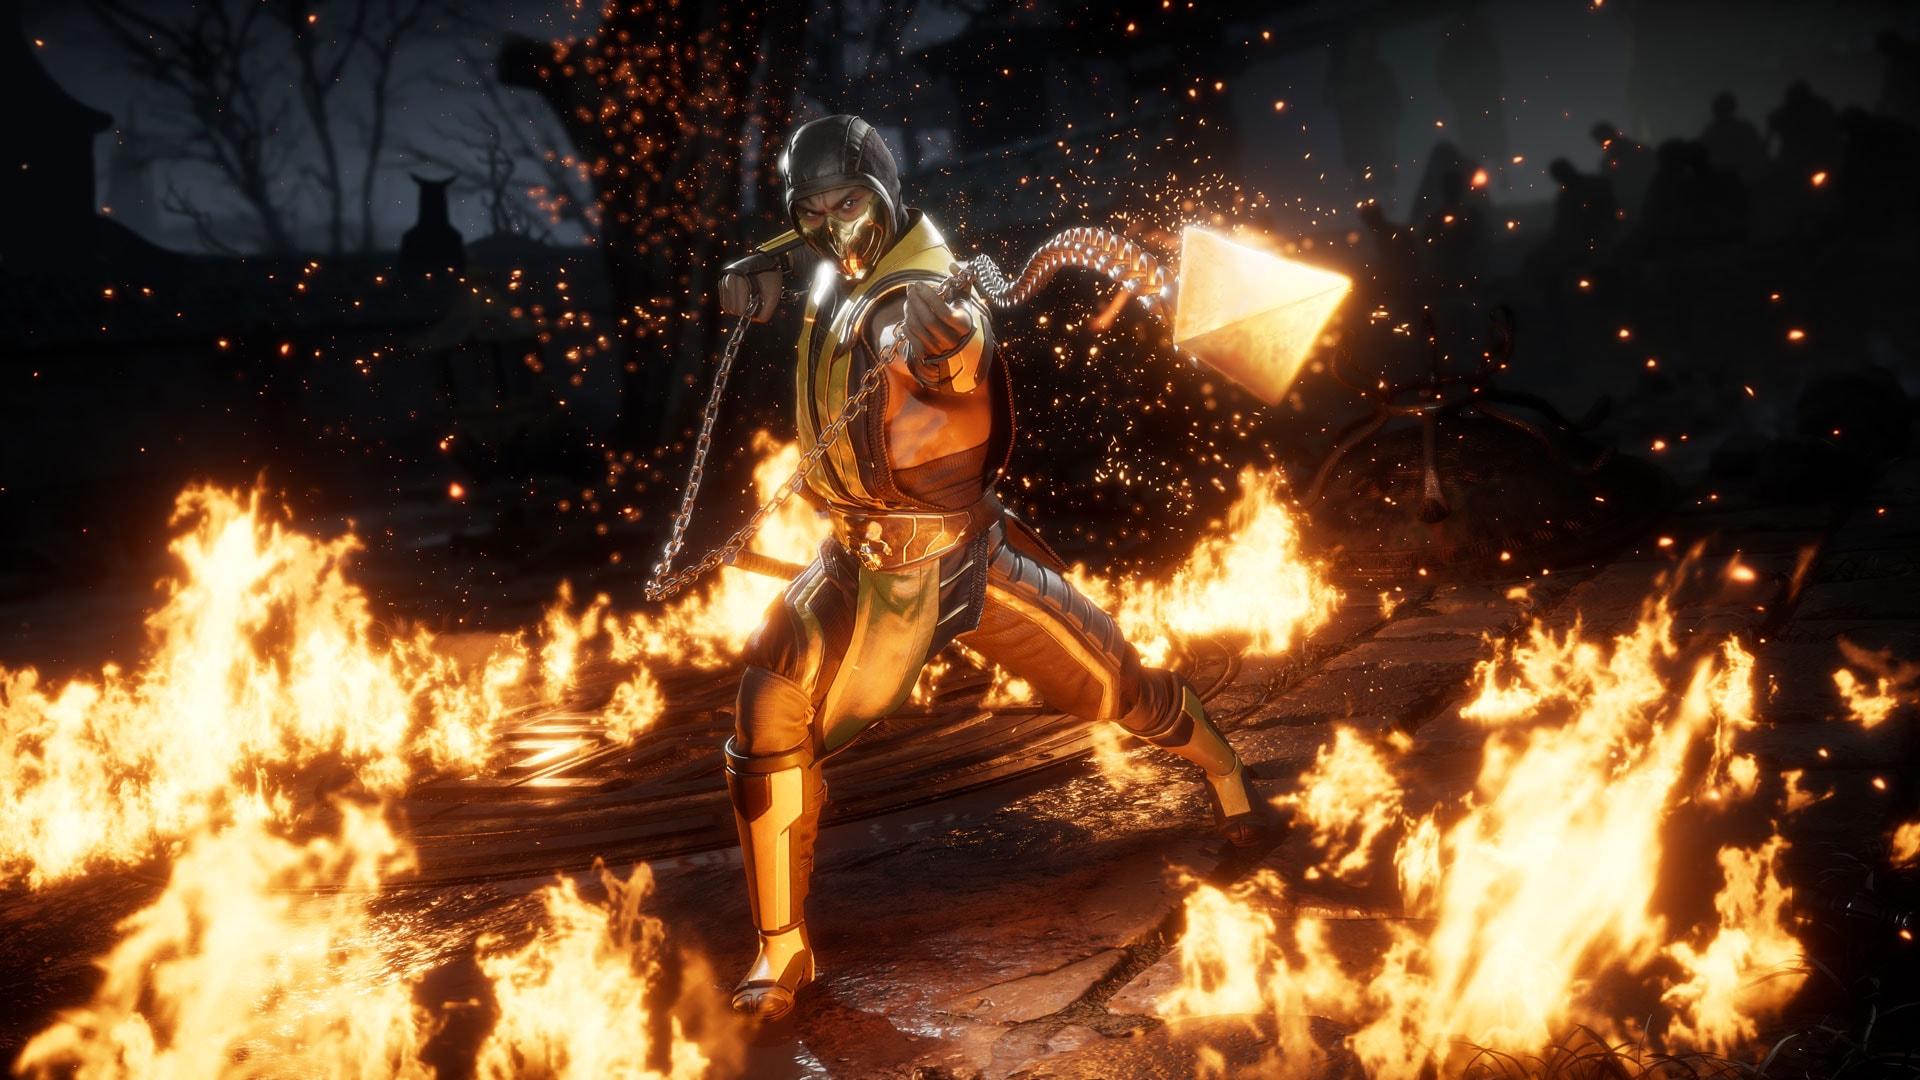 Mortal Kombat 11 | Aftermath Kollection (PS4, PS5) - PSN Key - UNITED STATES - 4